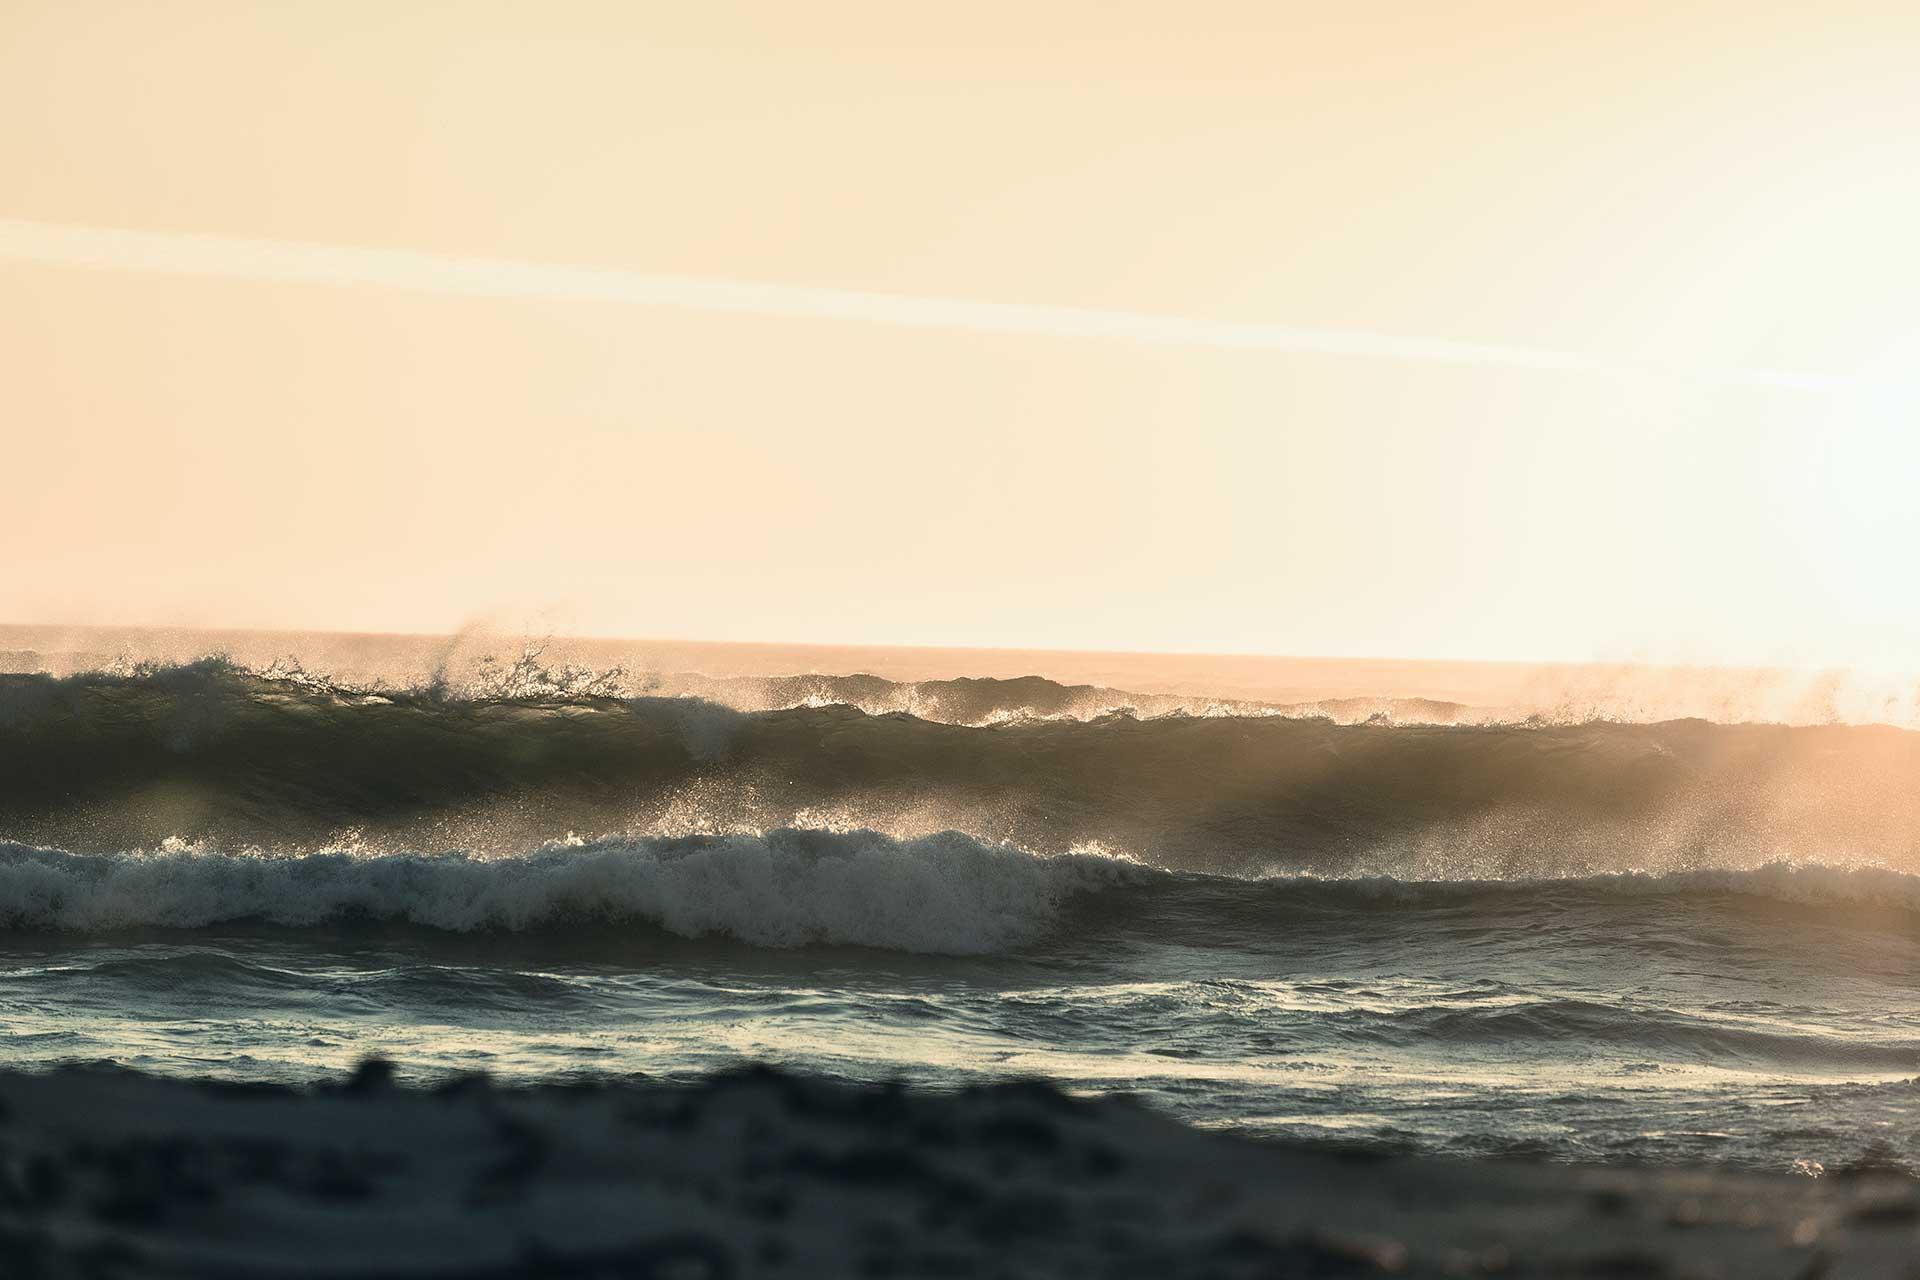 Meer Landschaft Strand Fotograf Sonnenuntergang Kapstadt Südafrika